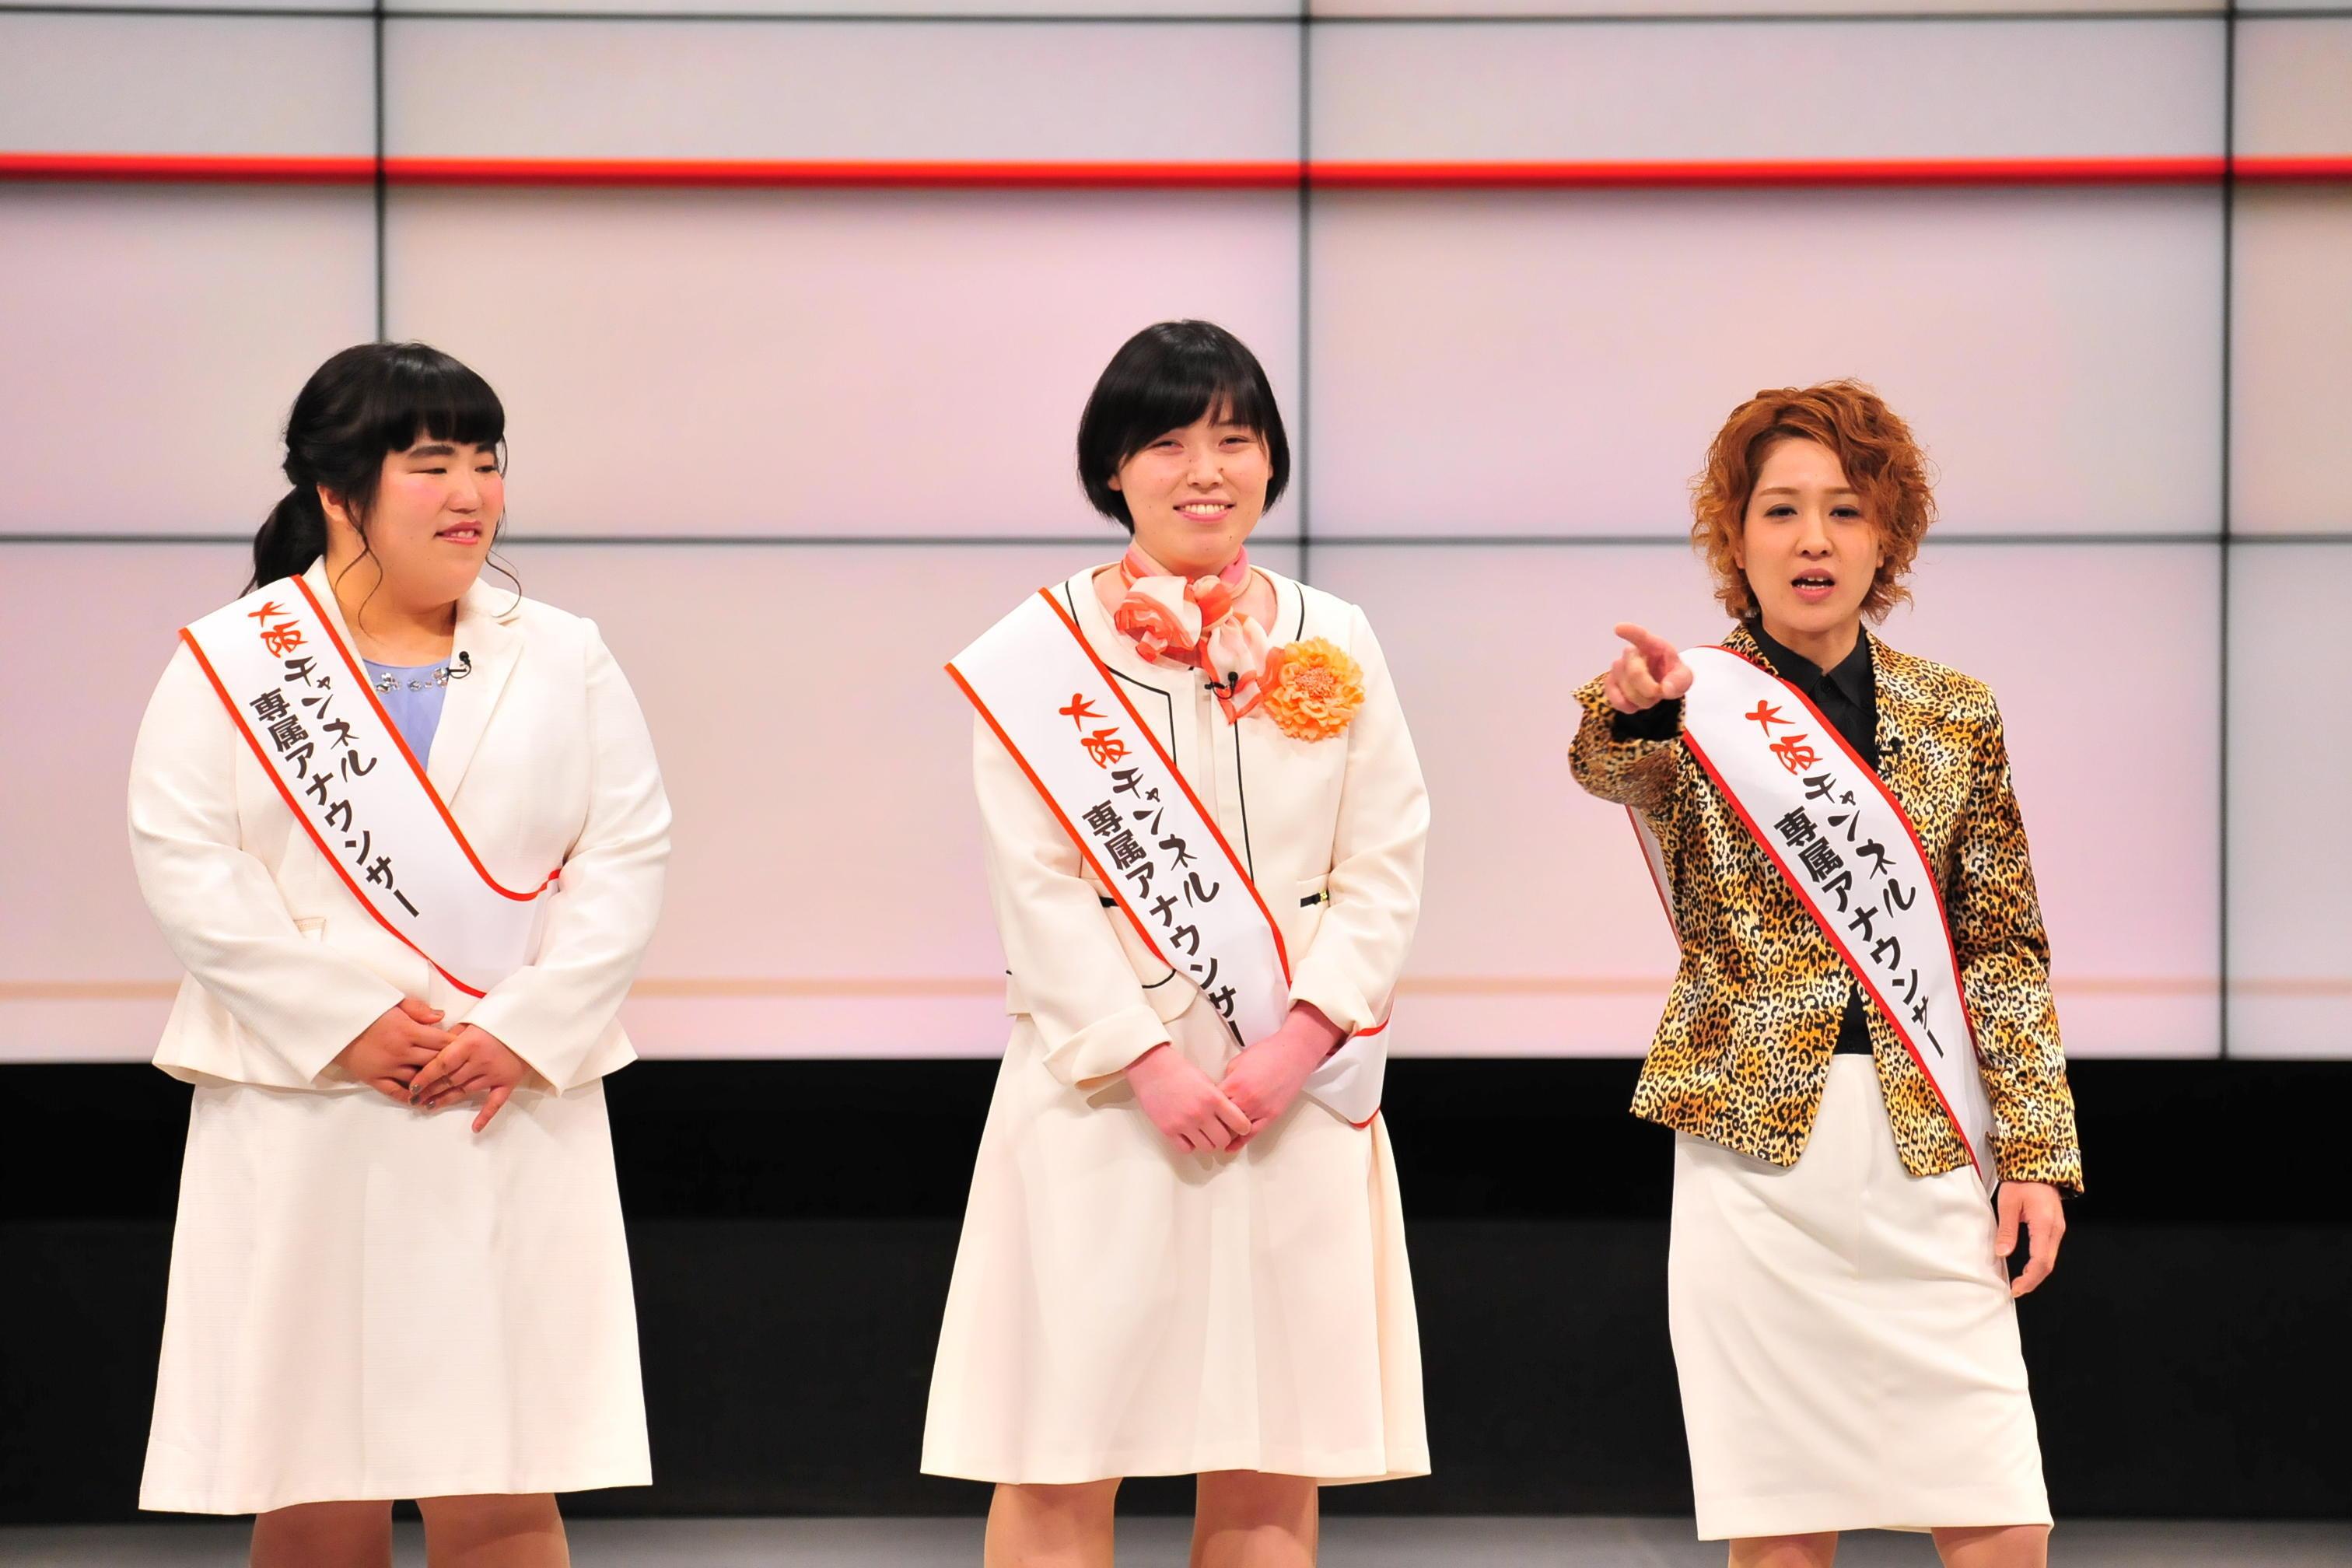 http://news.yoshimoto.co.jp/20170425161340-337ddf7b97d817d4a01ddb491b854b6edd7cb22b.jpg